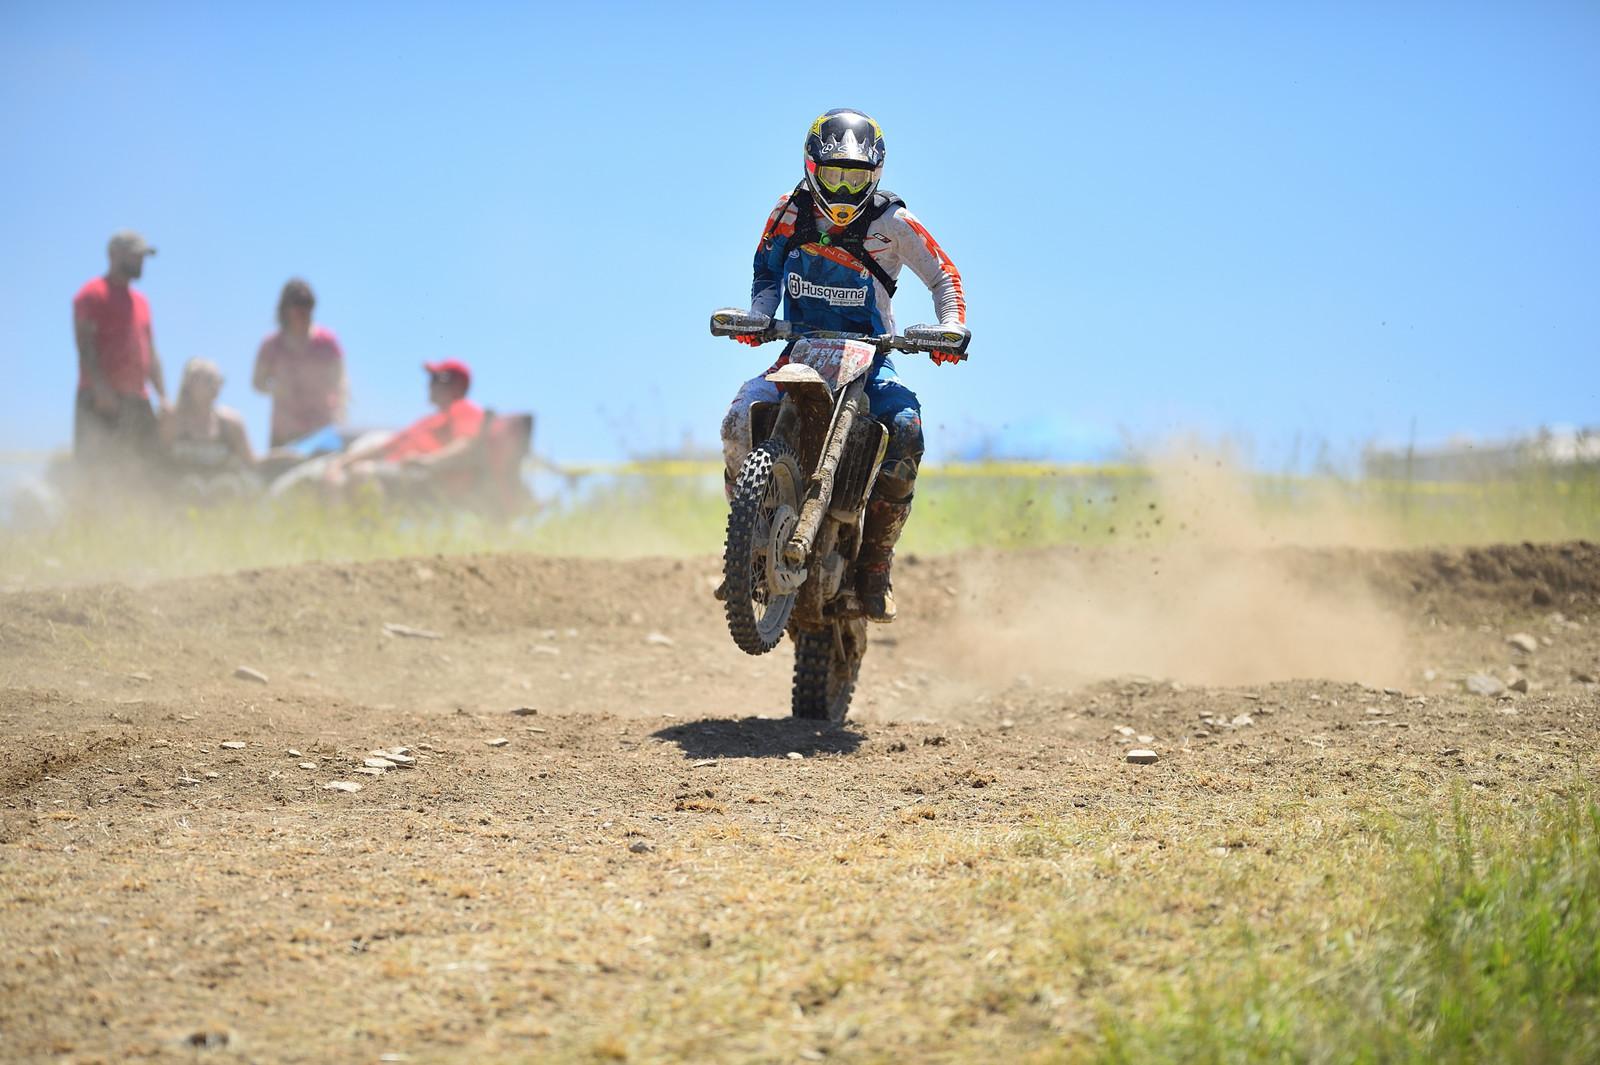 Josh Strang - Tomahawk GNCC - Motocross Pictures - Vital MX